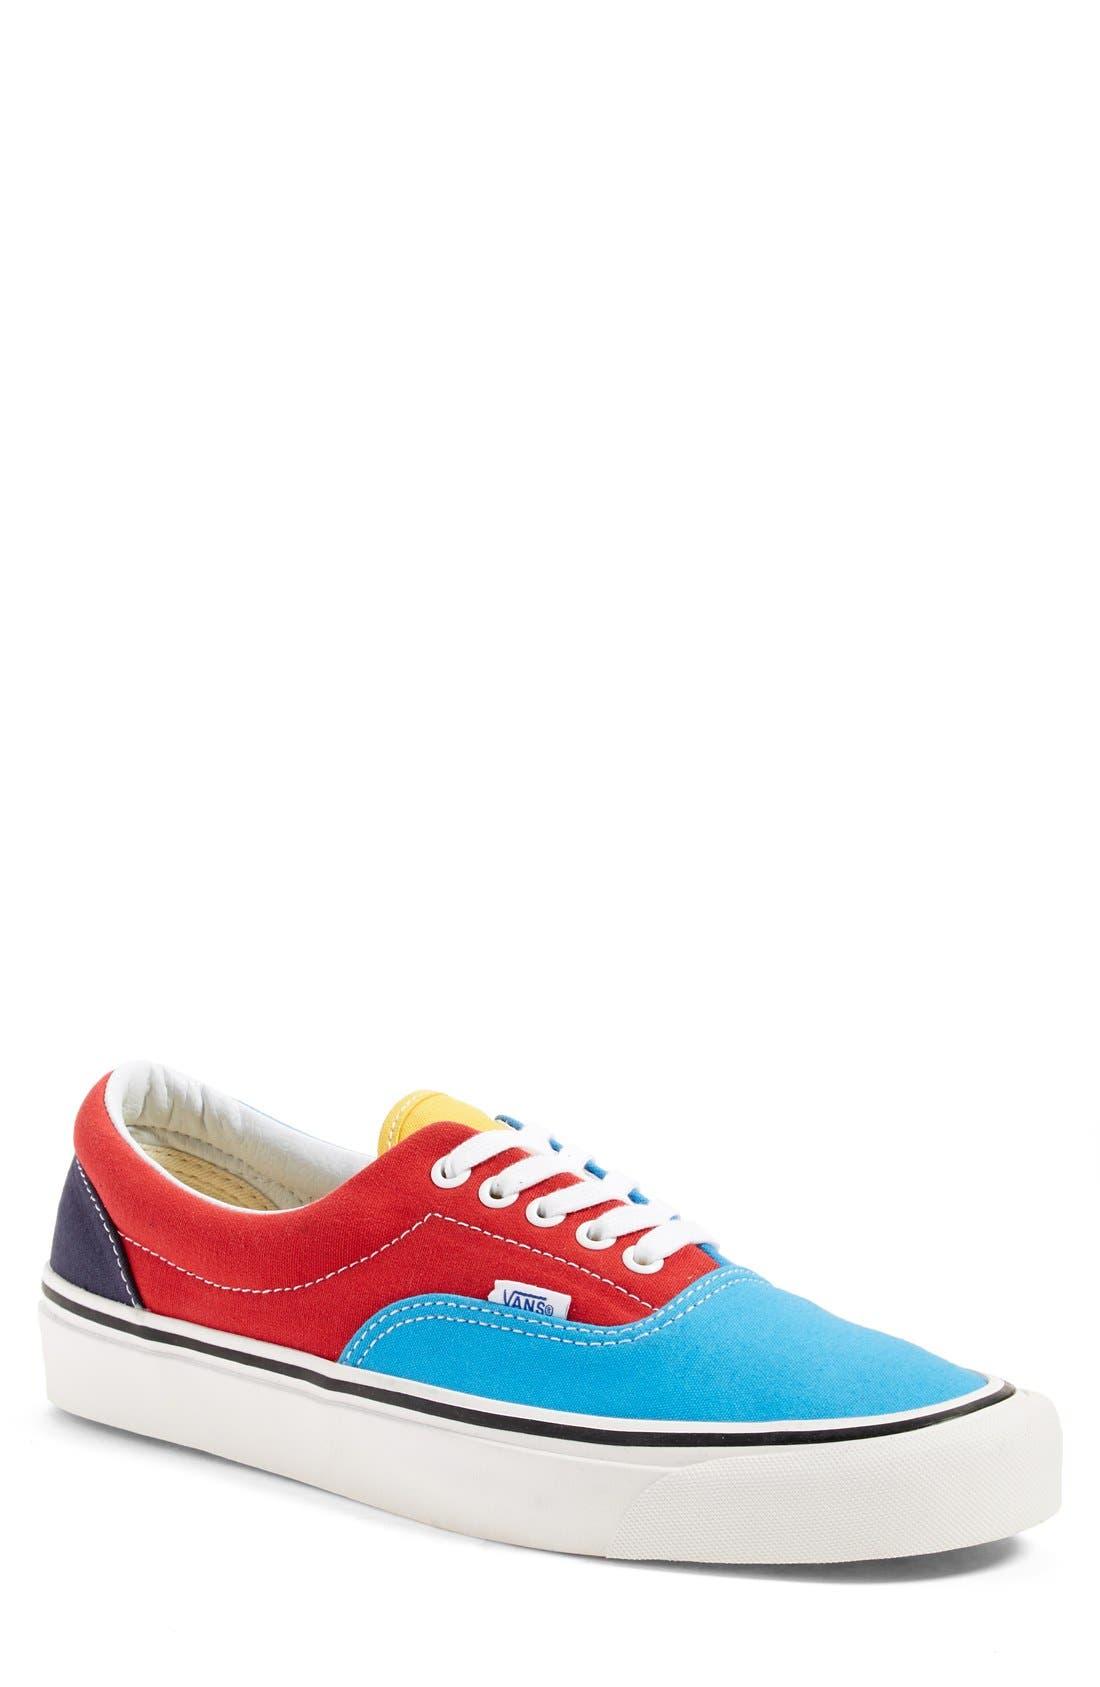 '50th Era 95 Reissue' Low Top Skate Sneaker,                             Alternate thumbnail 5, color,                             001